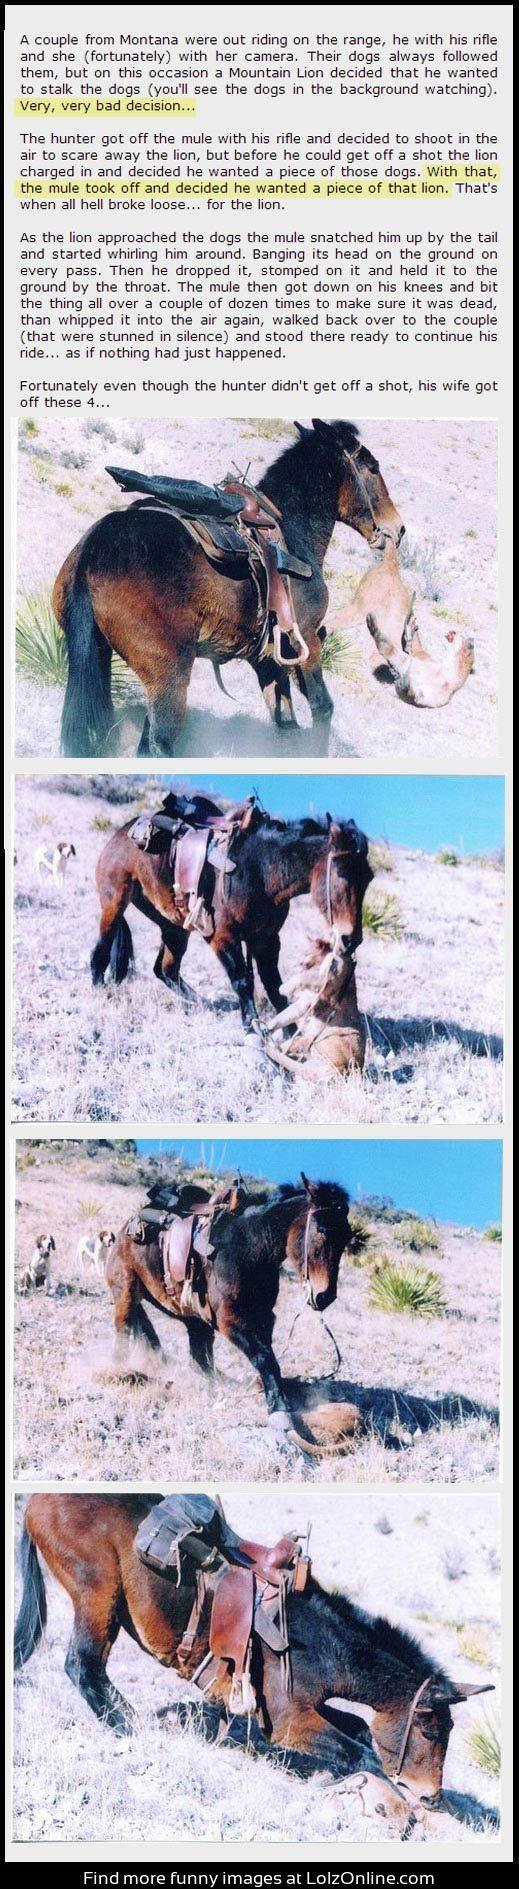 Badass mule. Wow!!!